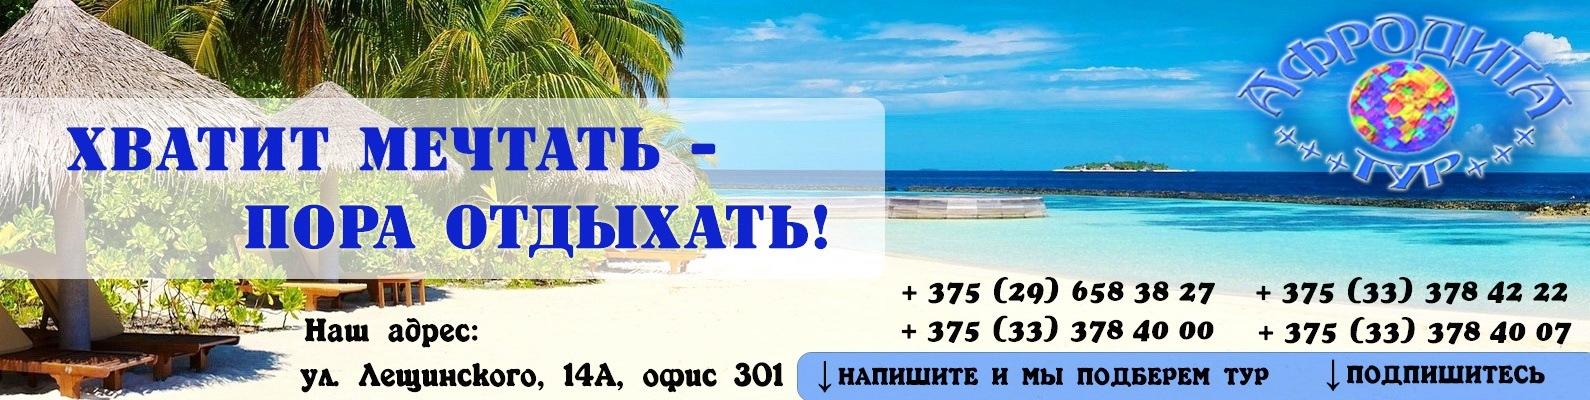 9b5bd0eb31c3 Турагентство, Минск горящие Афродита-Тур туры   ВКонтакте